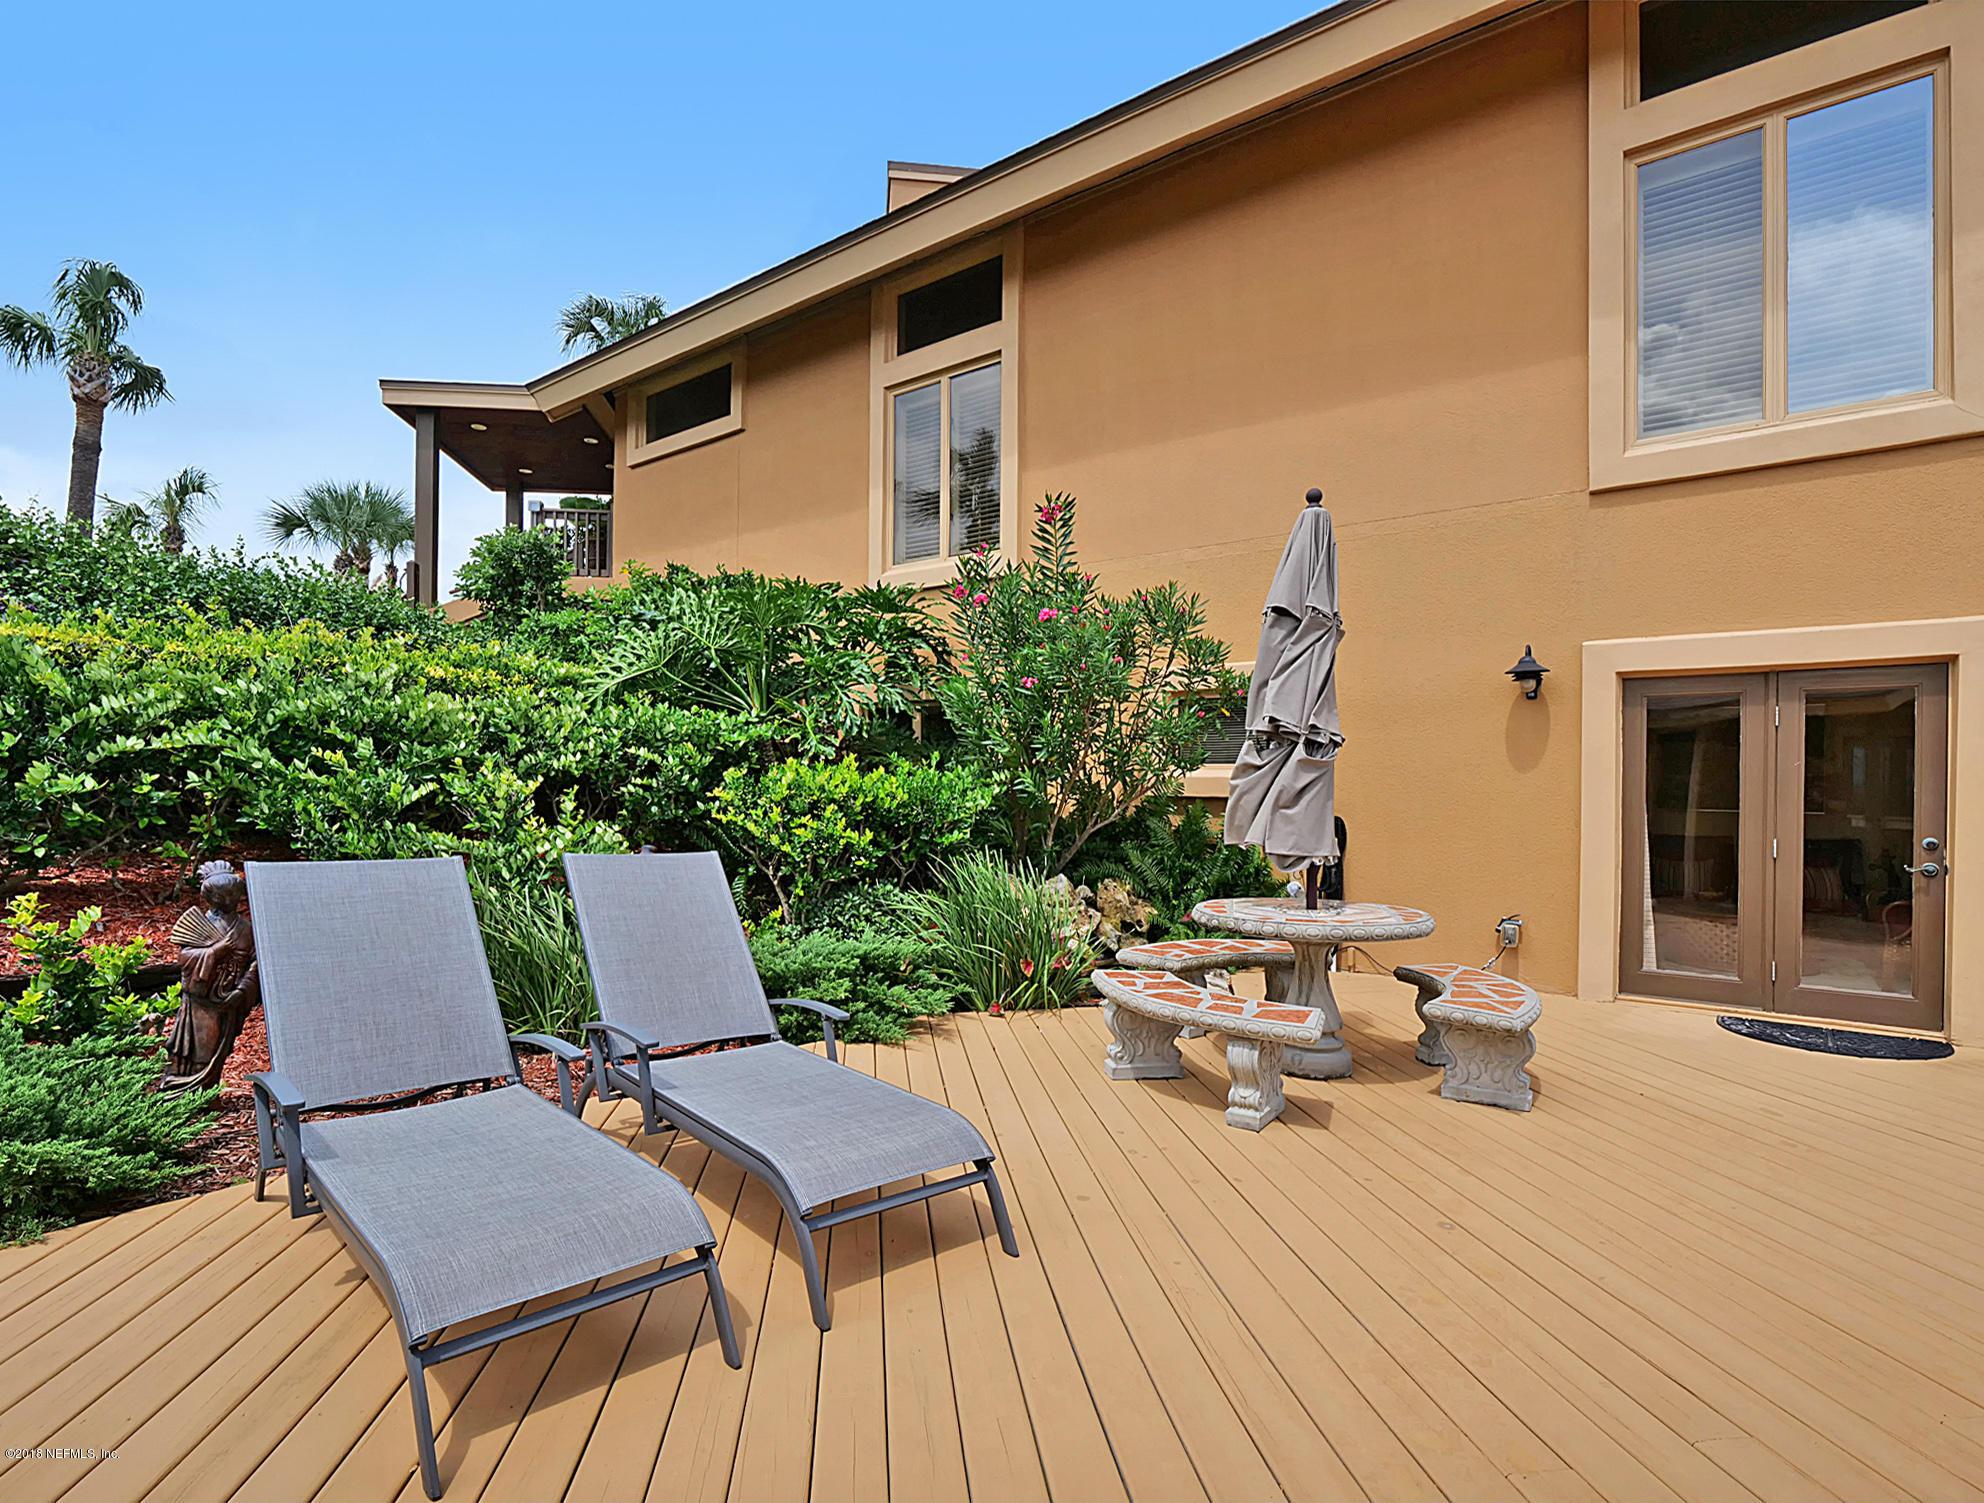 1123 PONTE VEDRA, PONTE VEDRA BEACH, FLORIDA 32082, 4 Bedrooms Bedrooms, ,3 BathroomsBathrooms,Residential - single family,For sale,PONTE VEDRA,926509